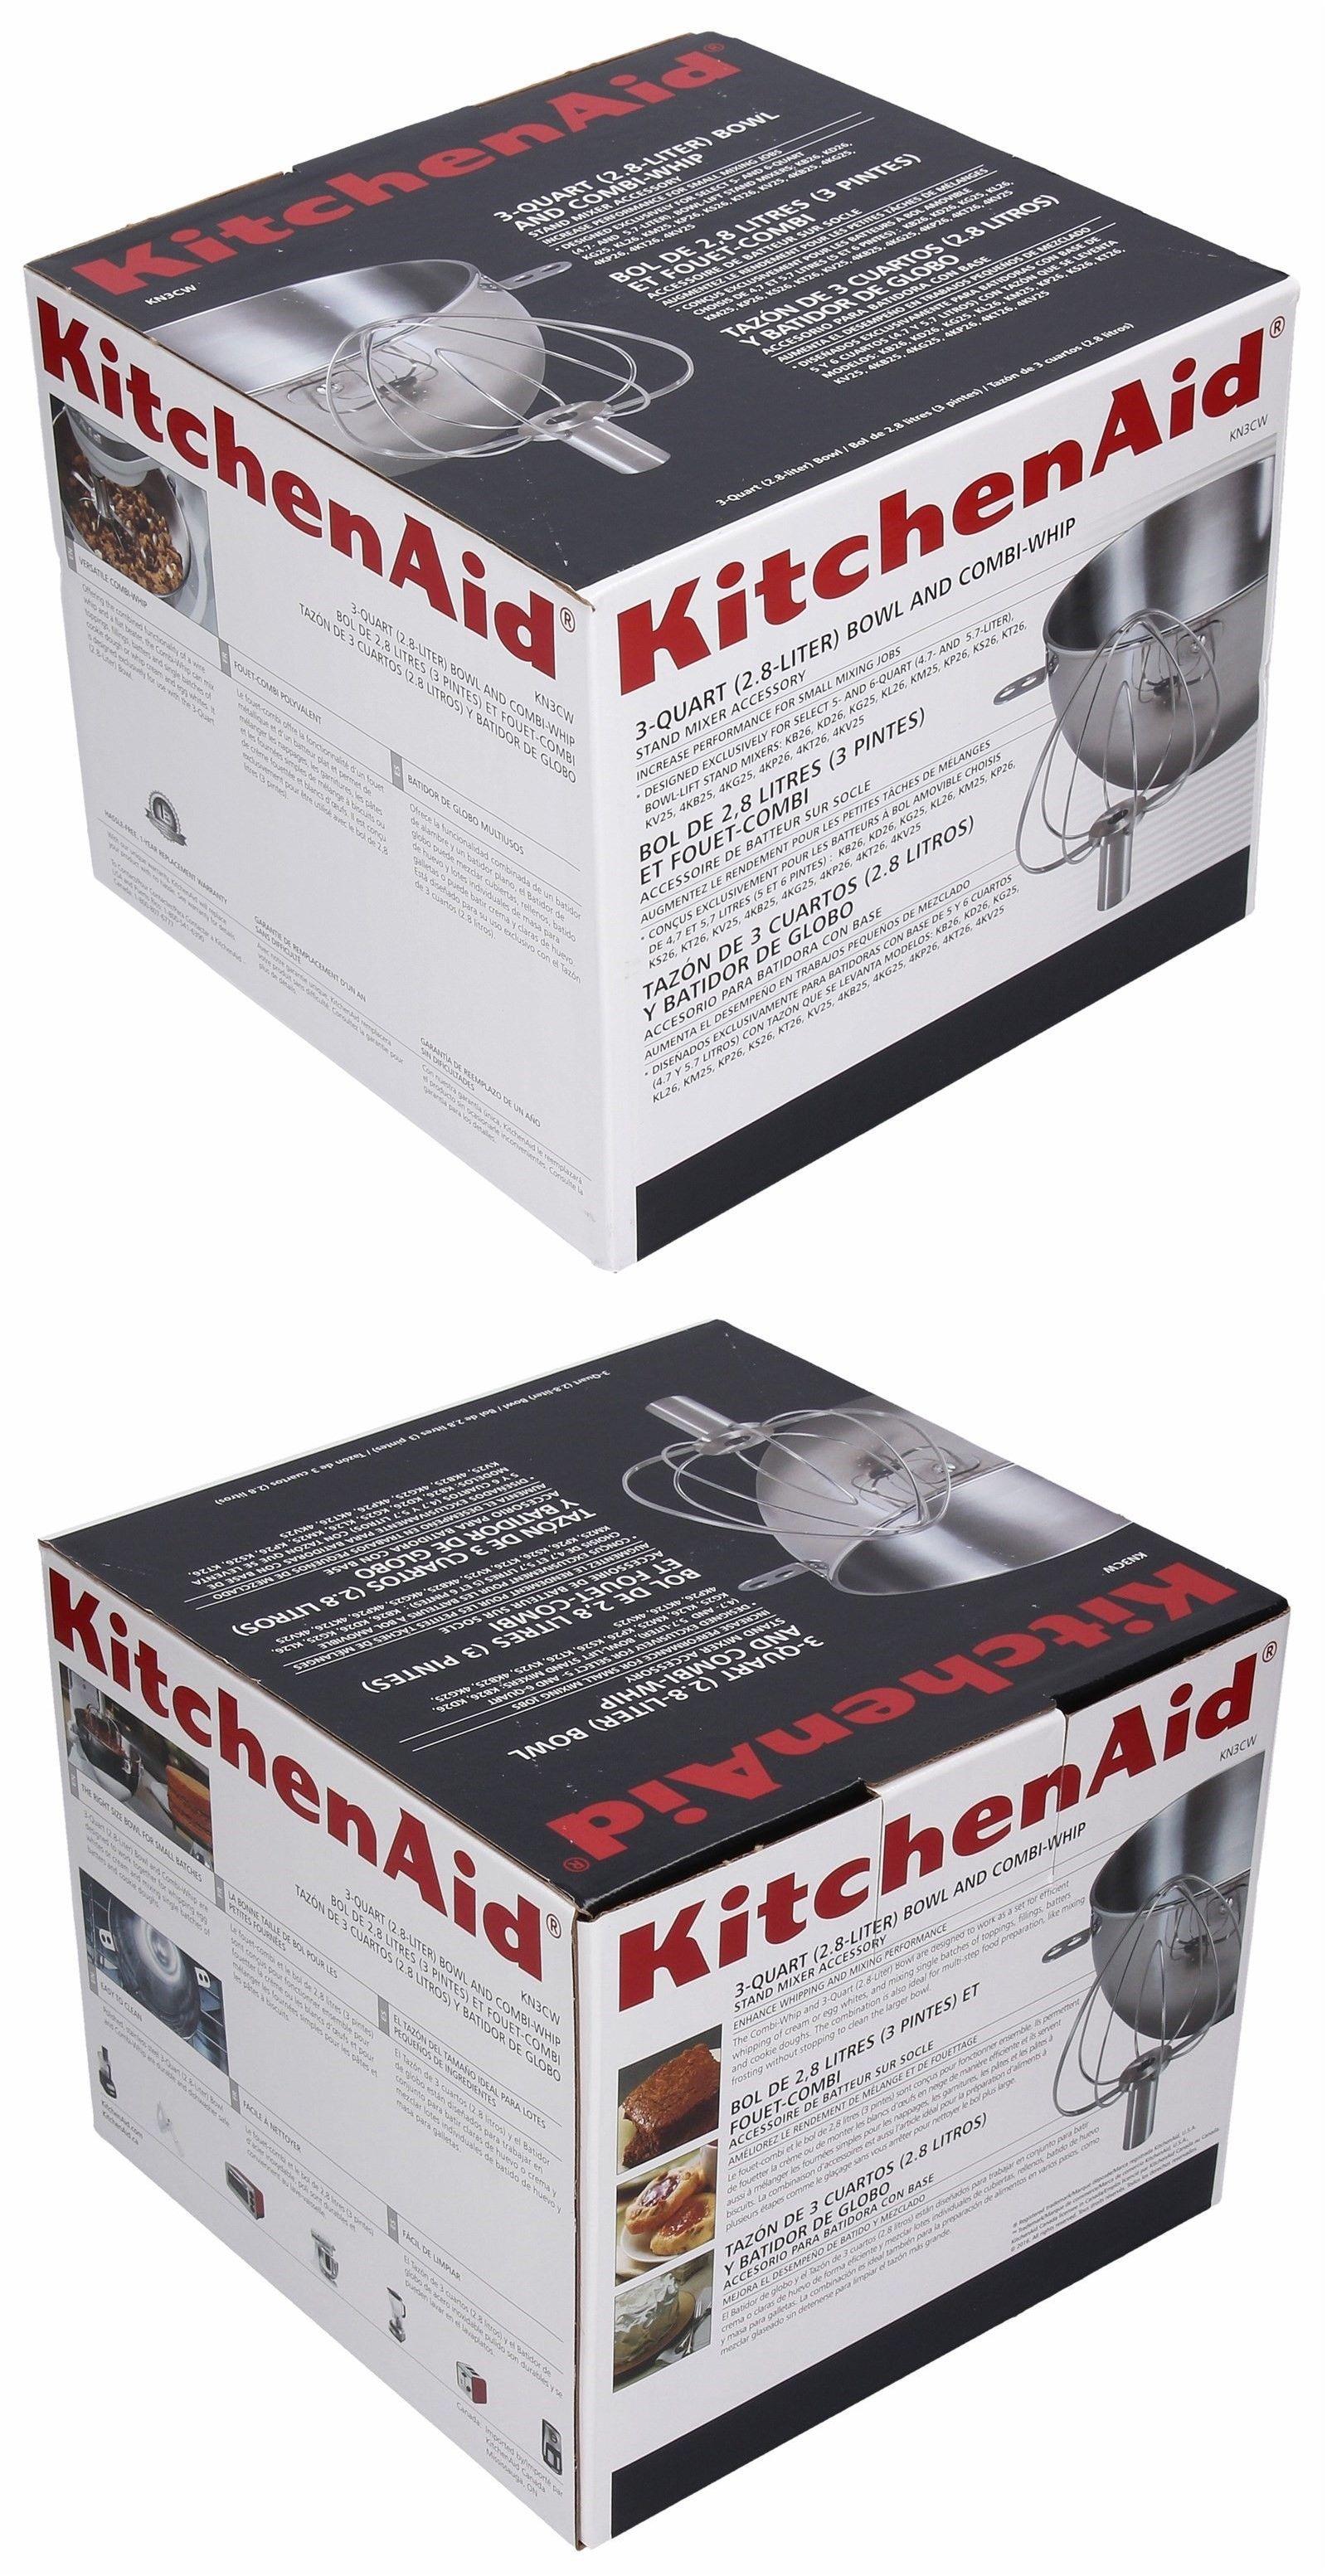 634b7e0252ad6ebffca6edfe8252d9e9 Kitchenaid 3 Qt Mixer Bowl